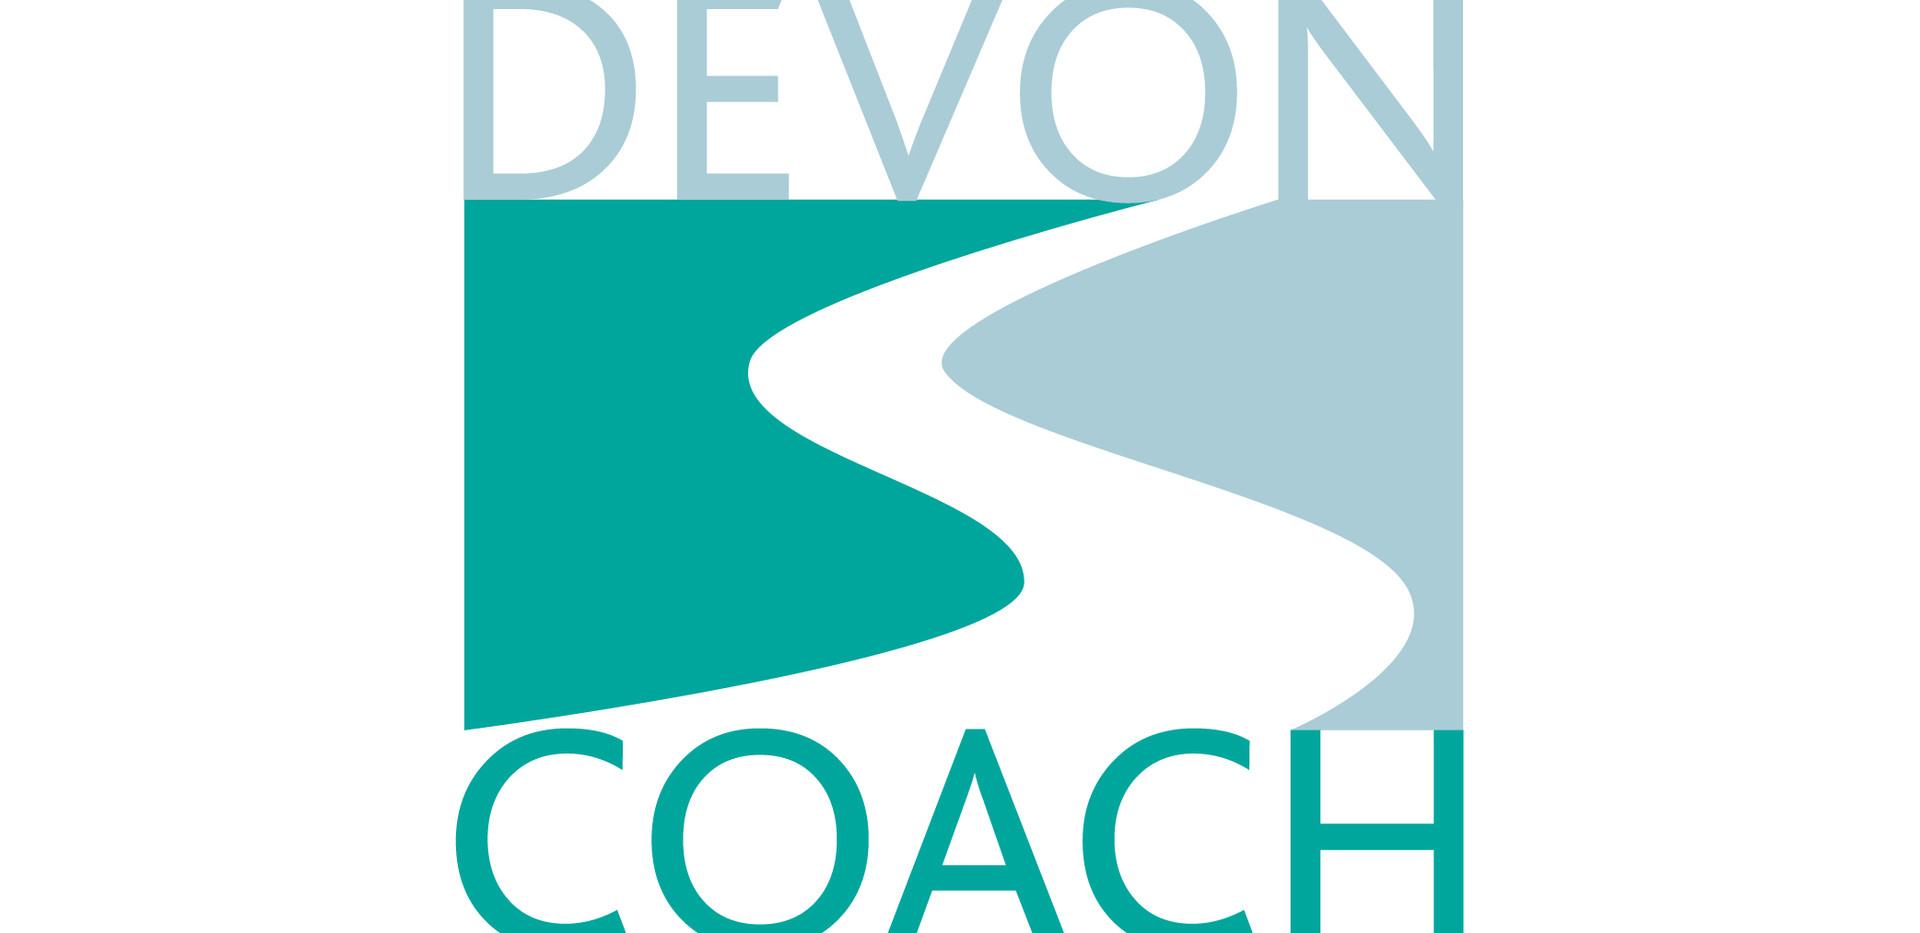 Devon Coach.jpg